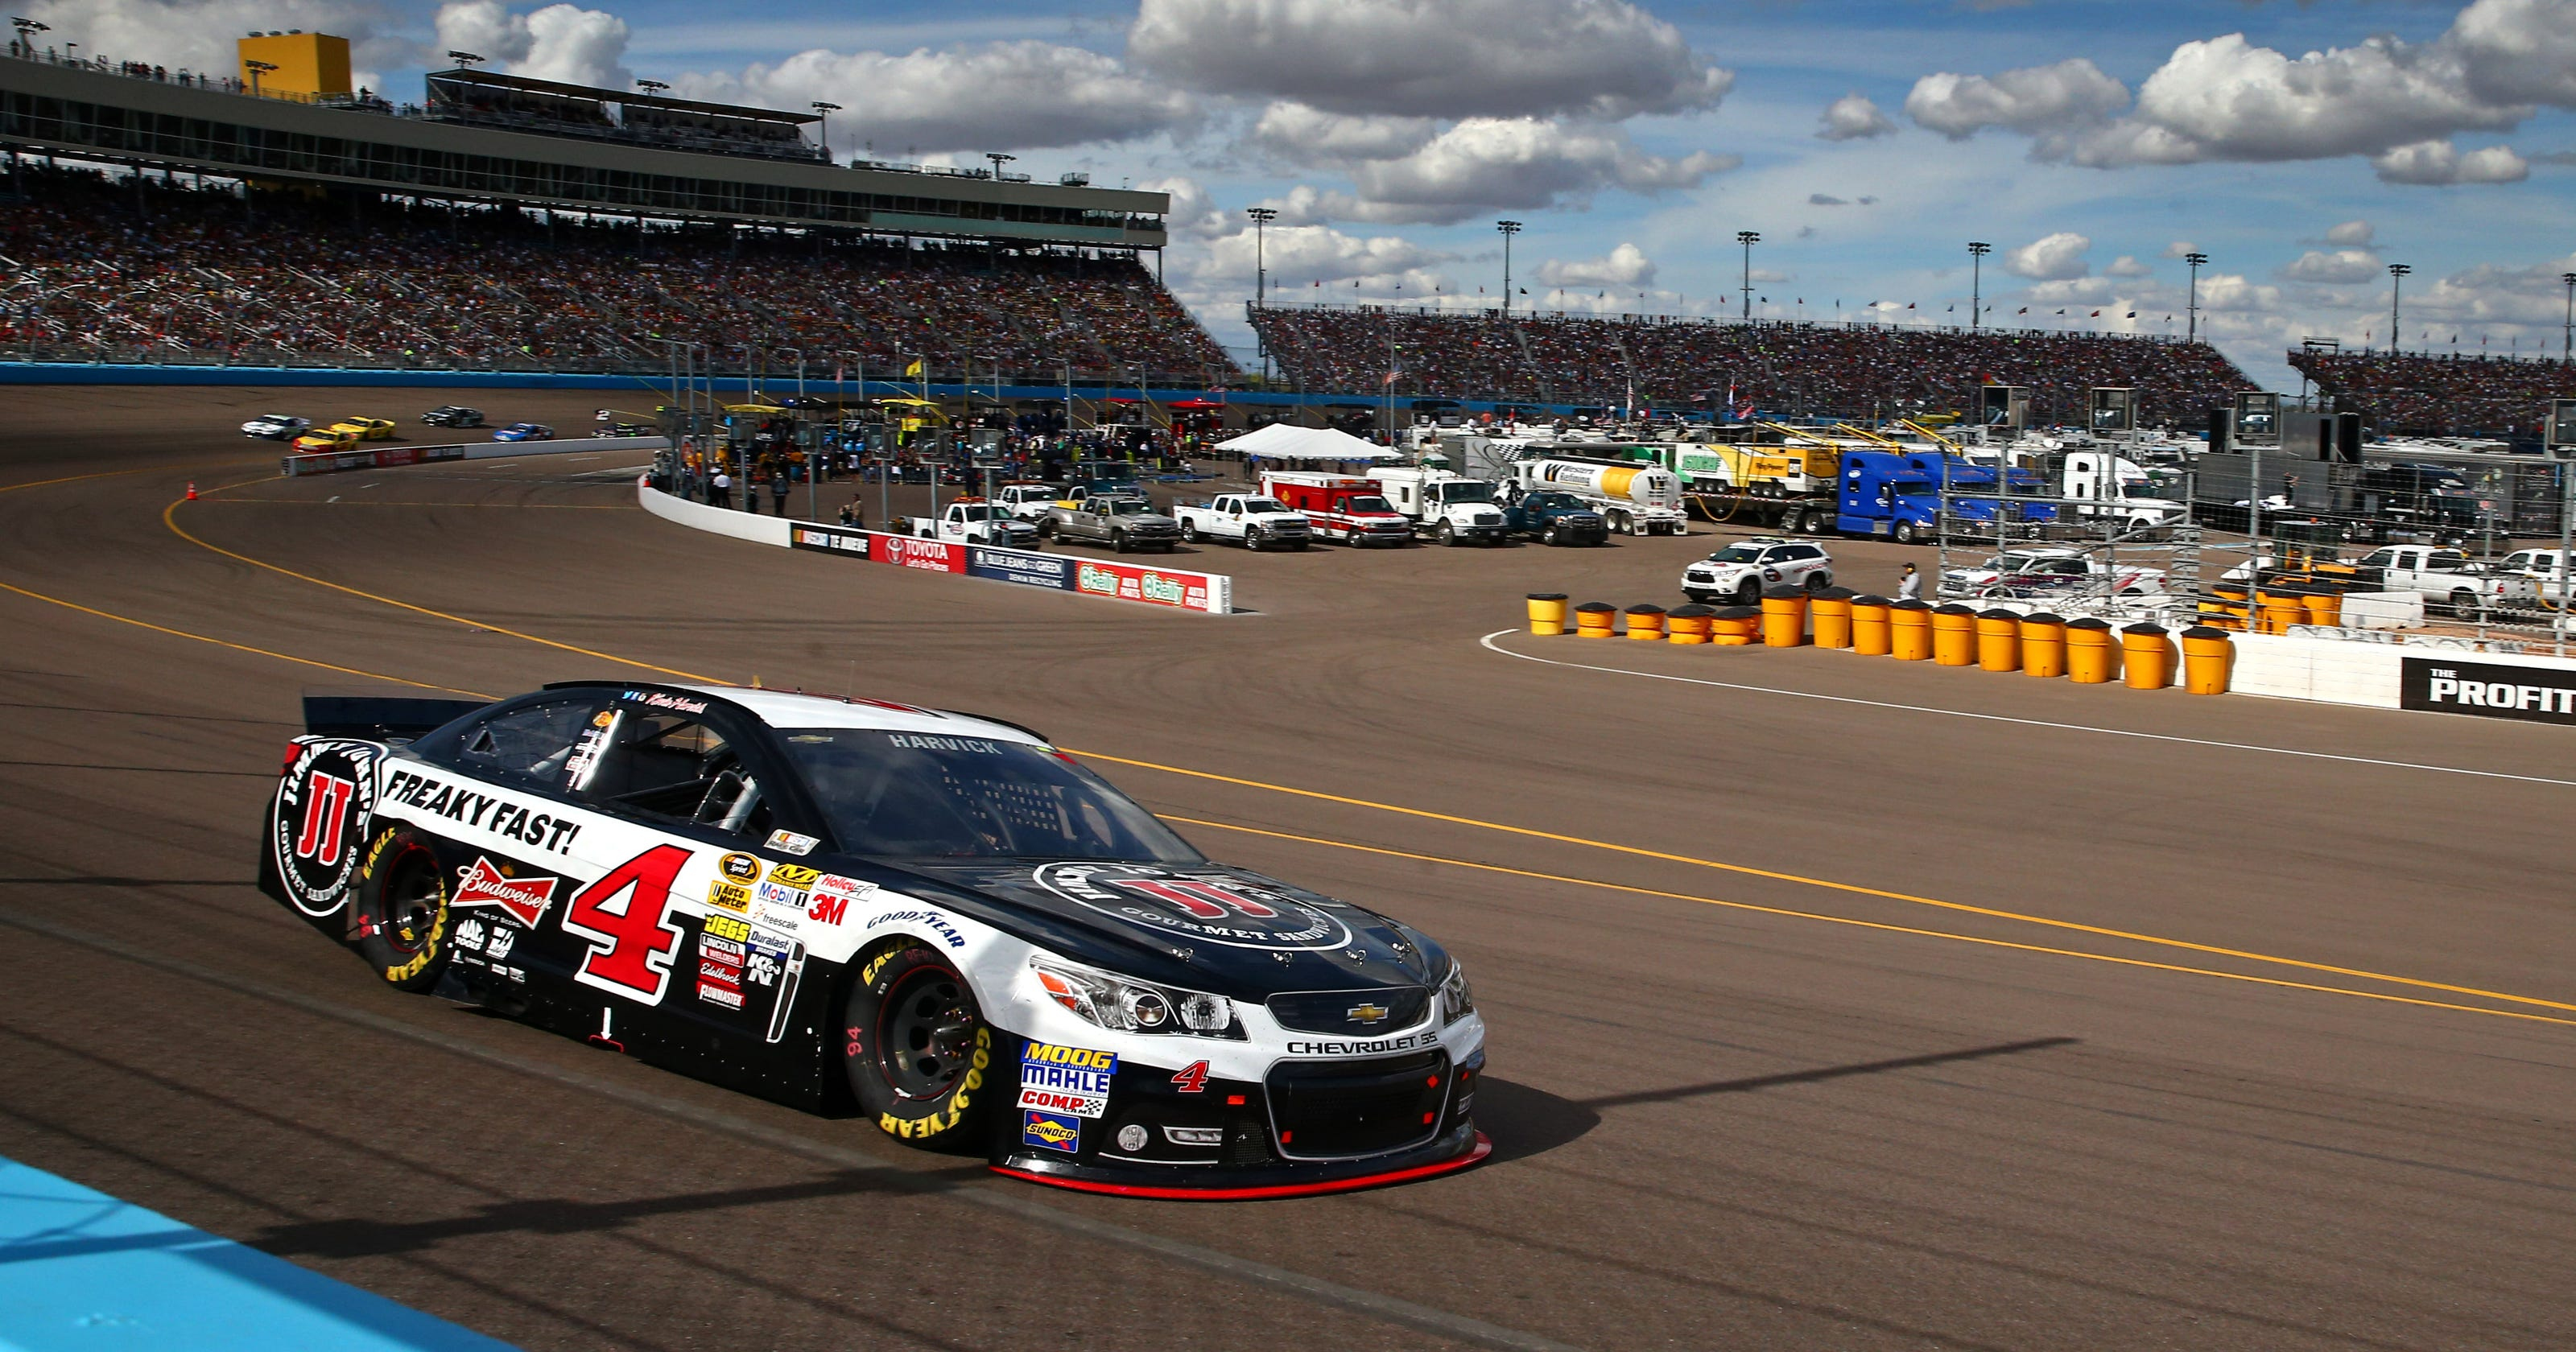 NASCAR at Phoenix: Start time, lineup, TV schedule